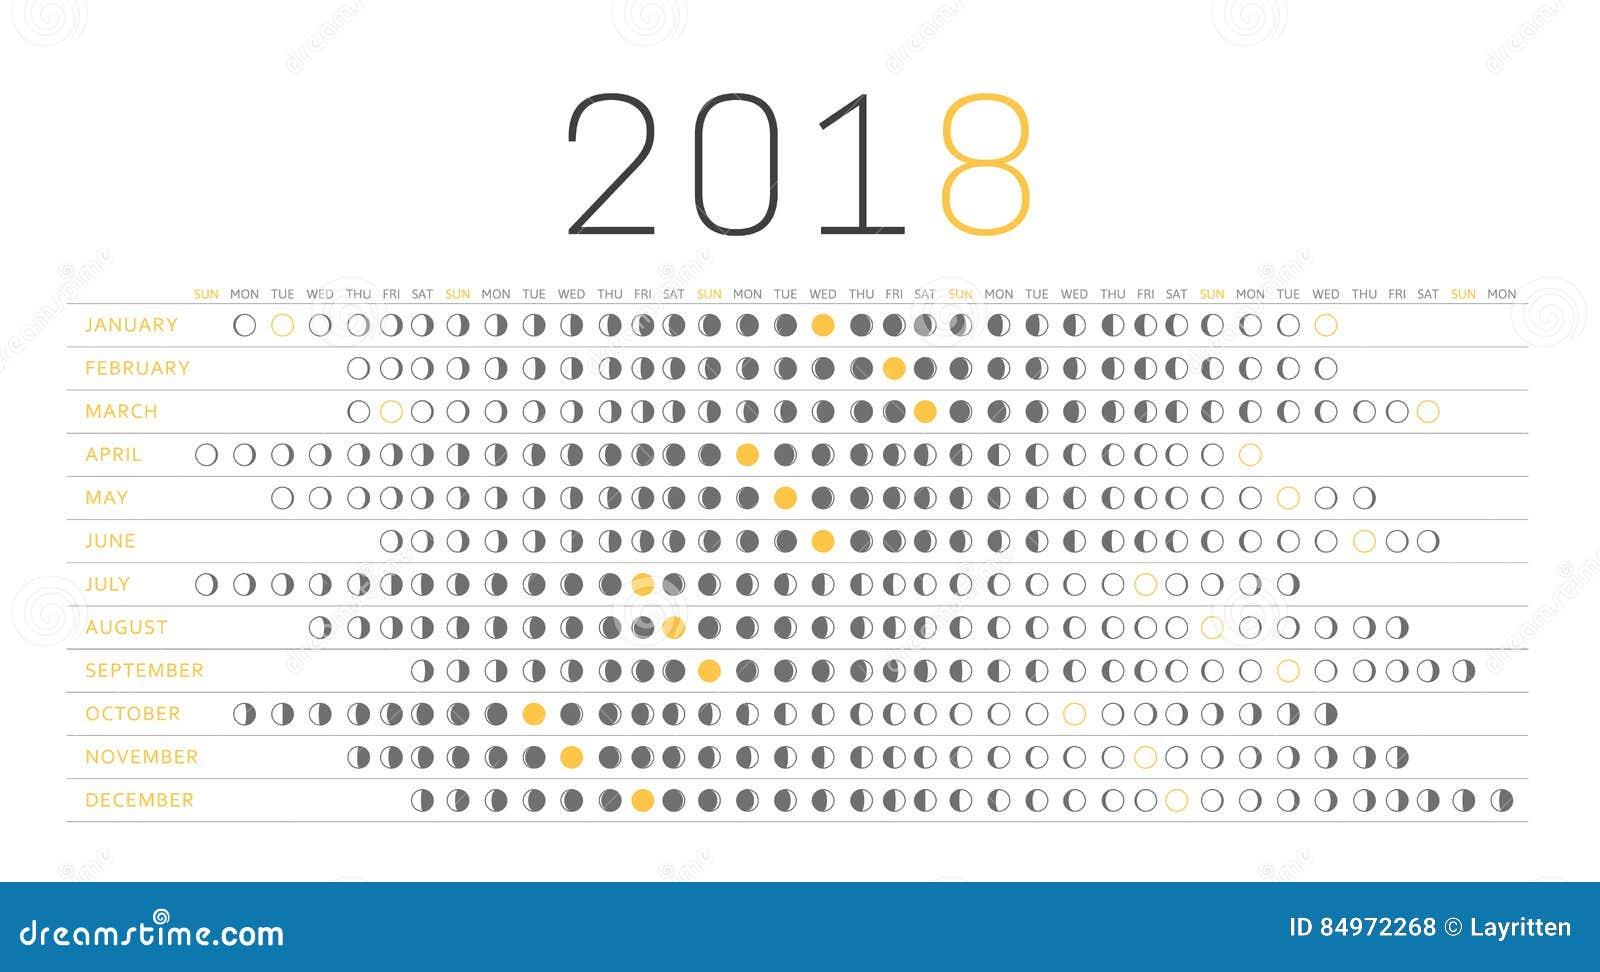 Calendrier 2018 avec les lunes ub23 jornalagora - Calendrier de la lune 2017 ...